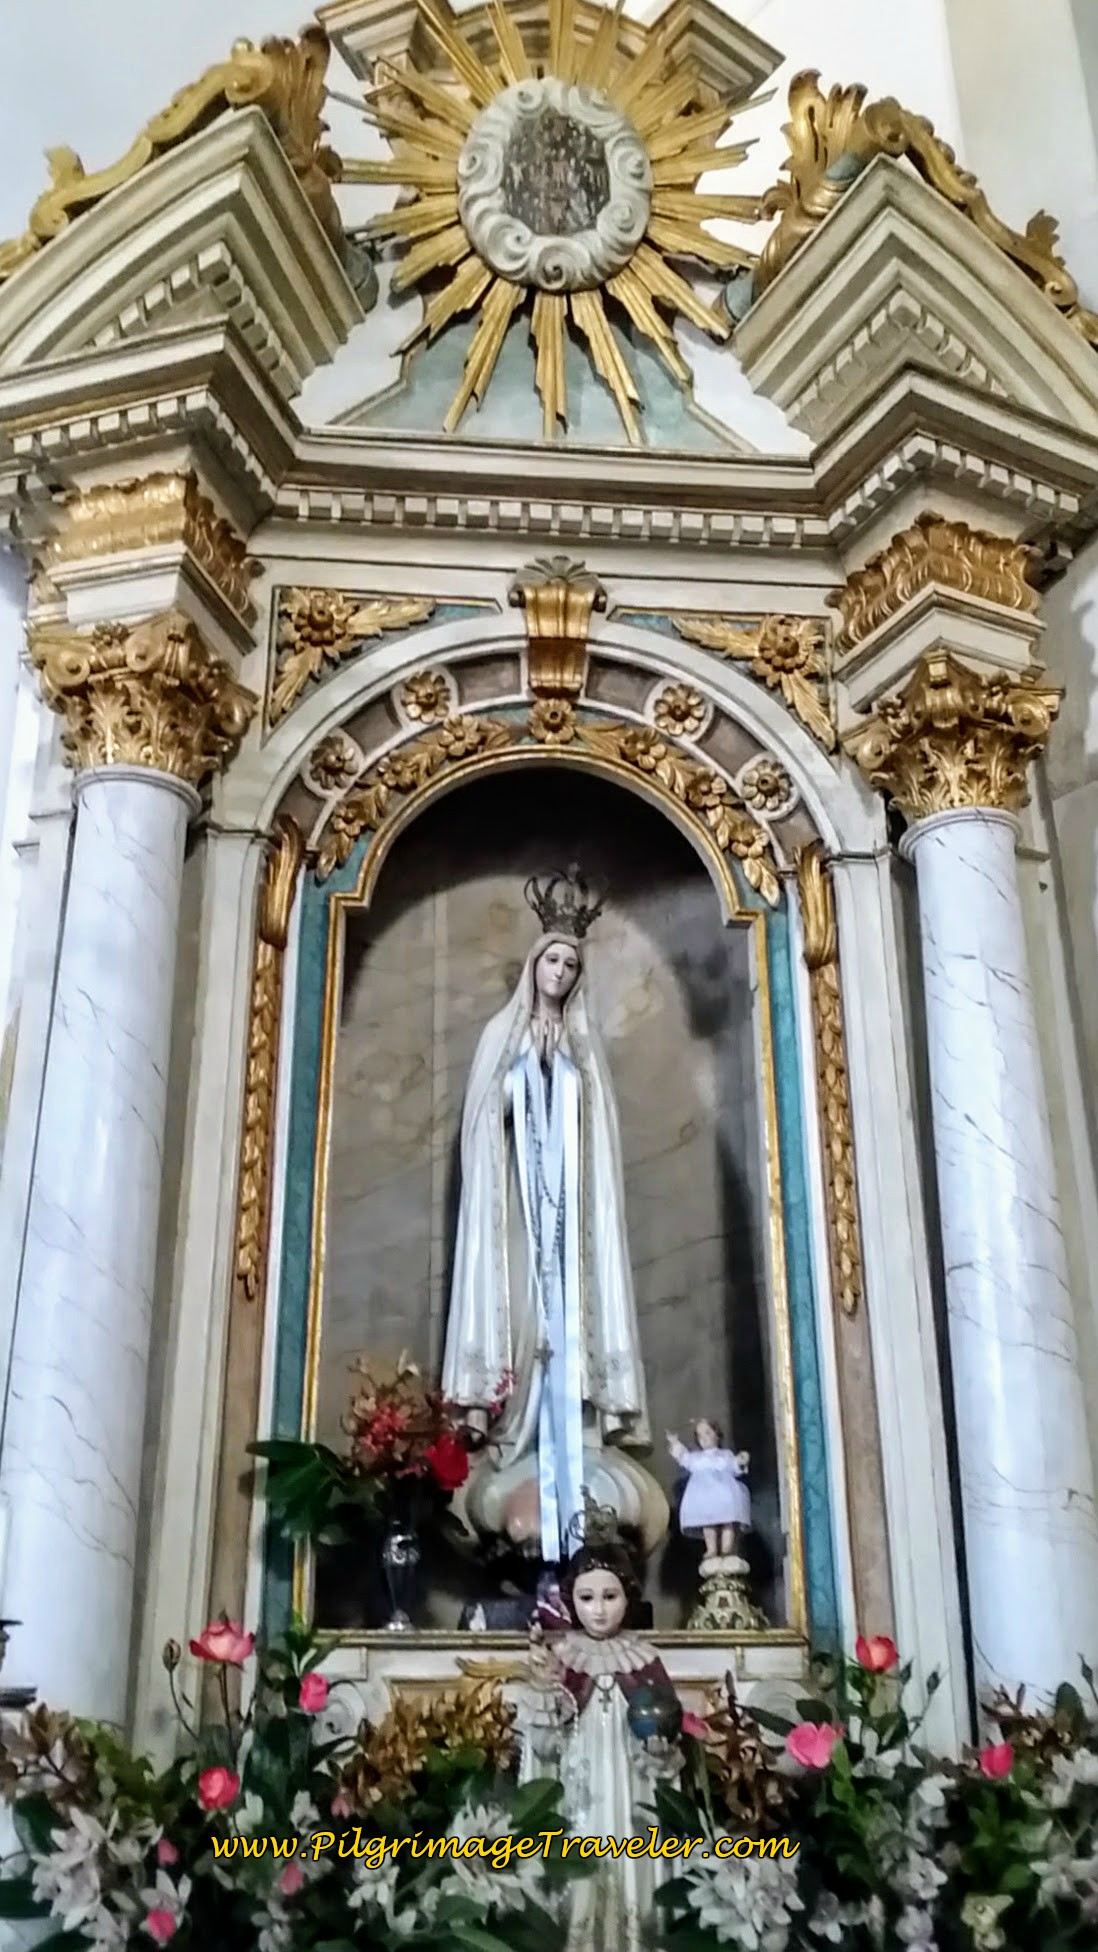 Altar to Fátima in Church